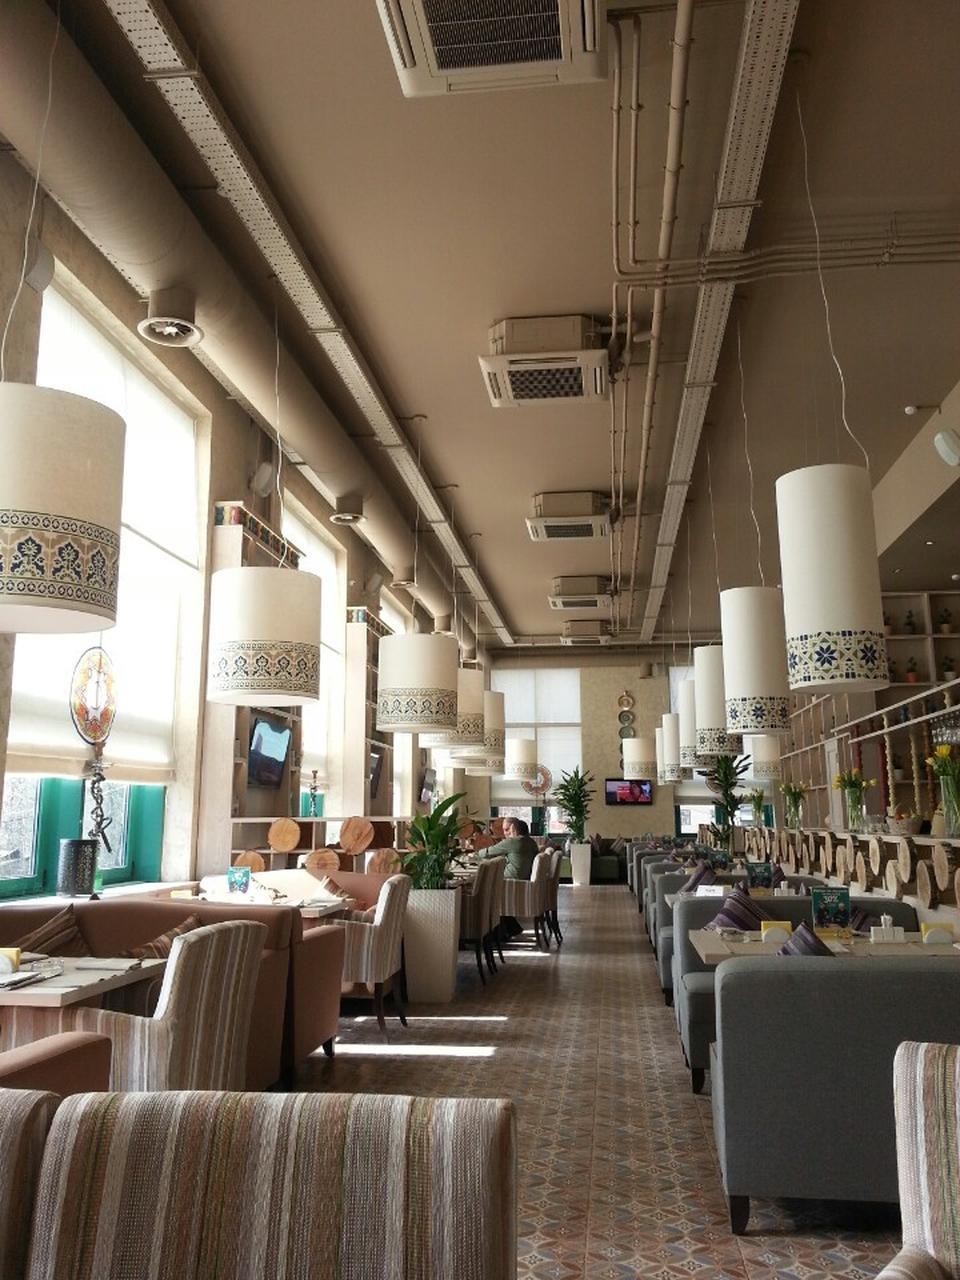 Восточное Кафе Лепешка в Королеве фото